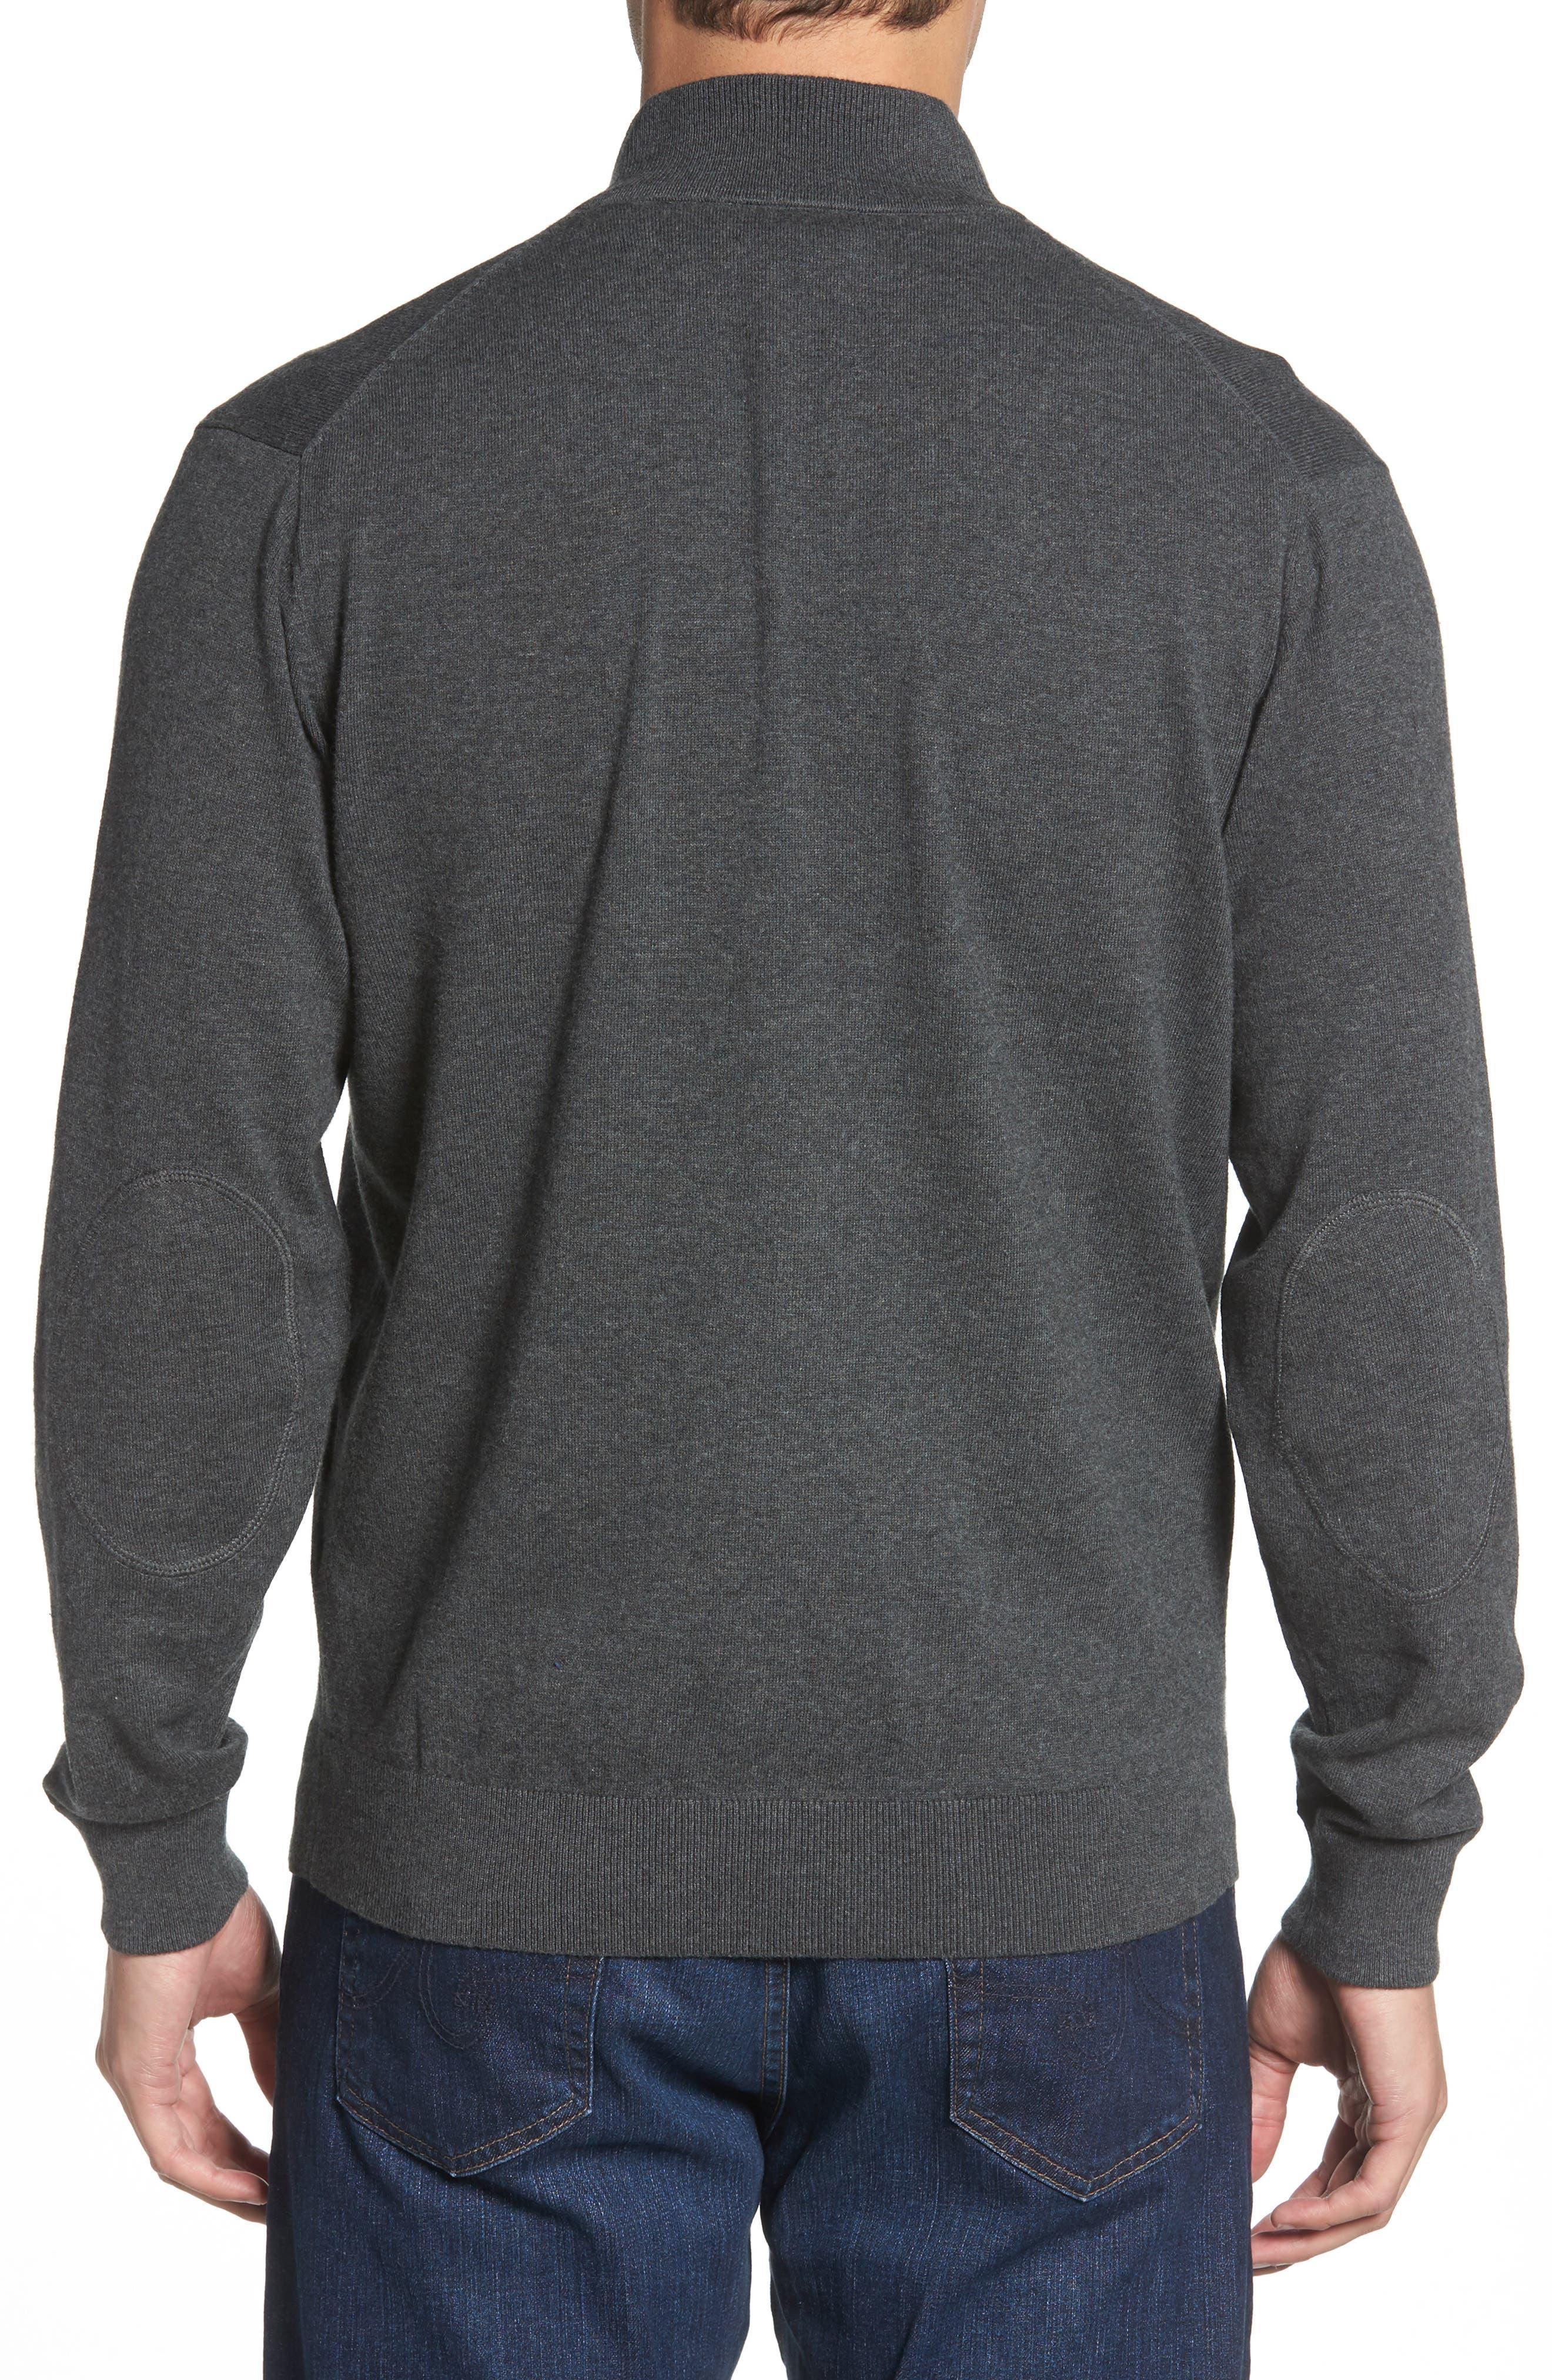 Seattle Seahawks - Lakemont Regular Fit Quarter Zip Sweater,                             Alternate thumbnail 2, color,                             CHARCOAL HEATHER